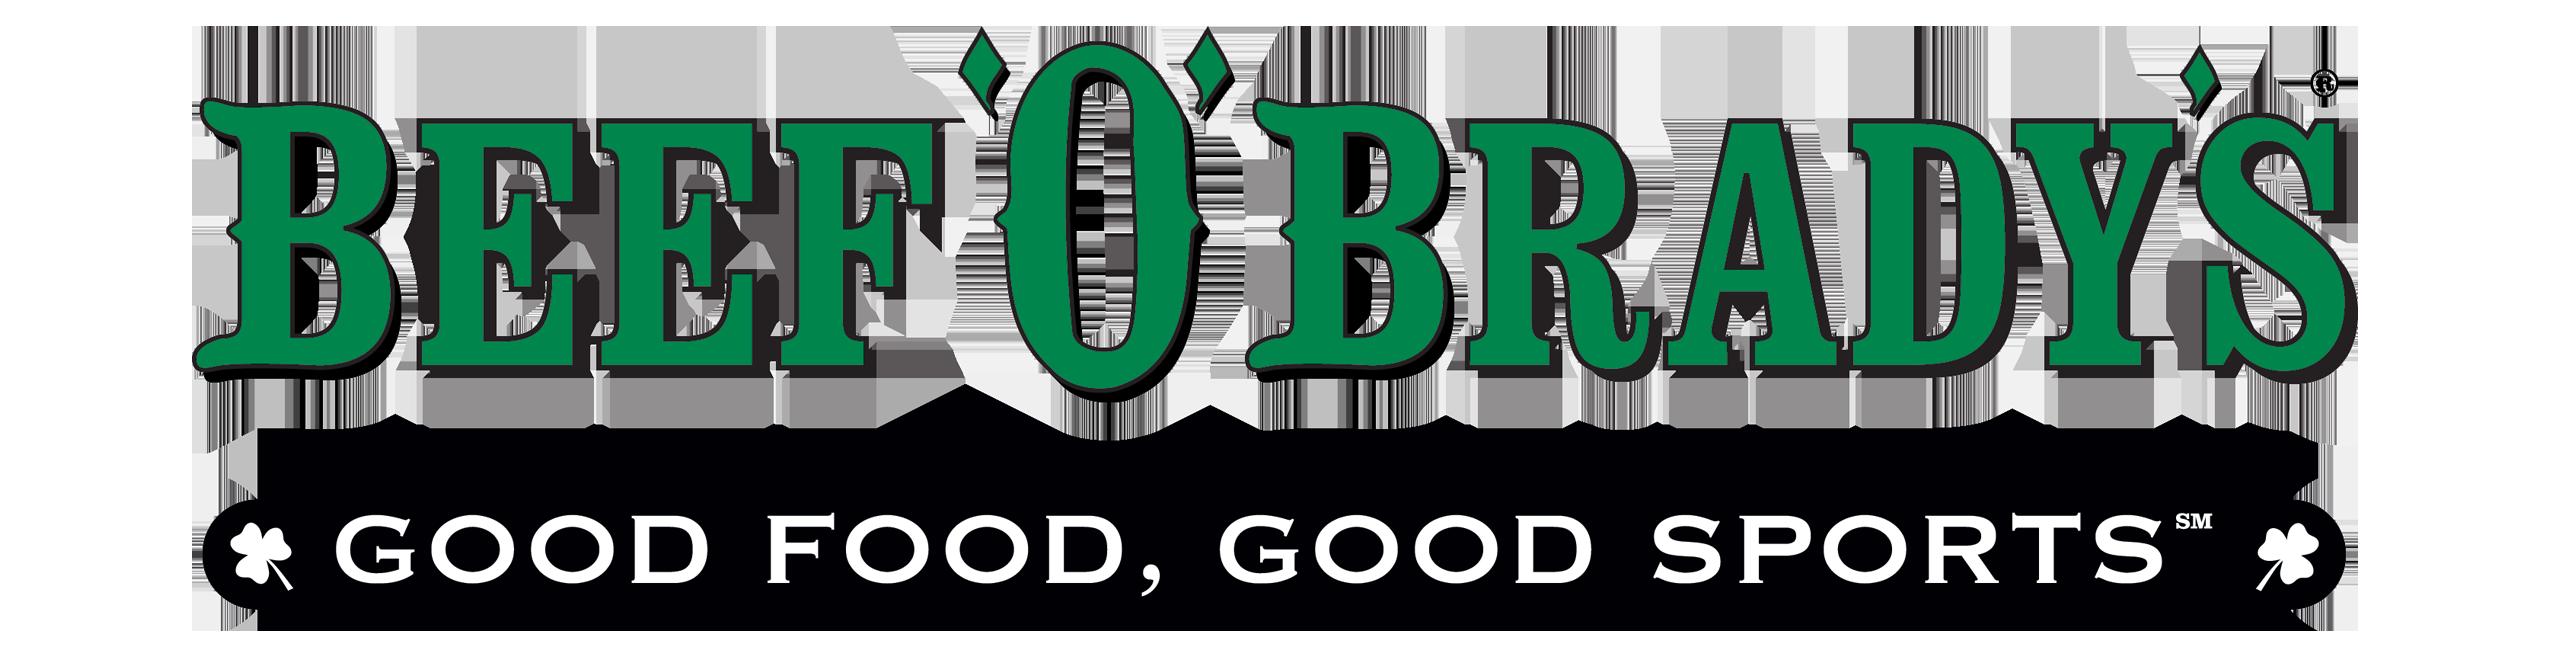 Beef OBradys